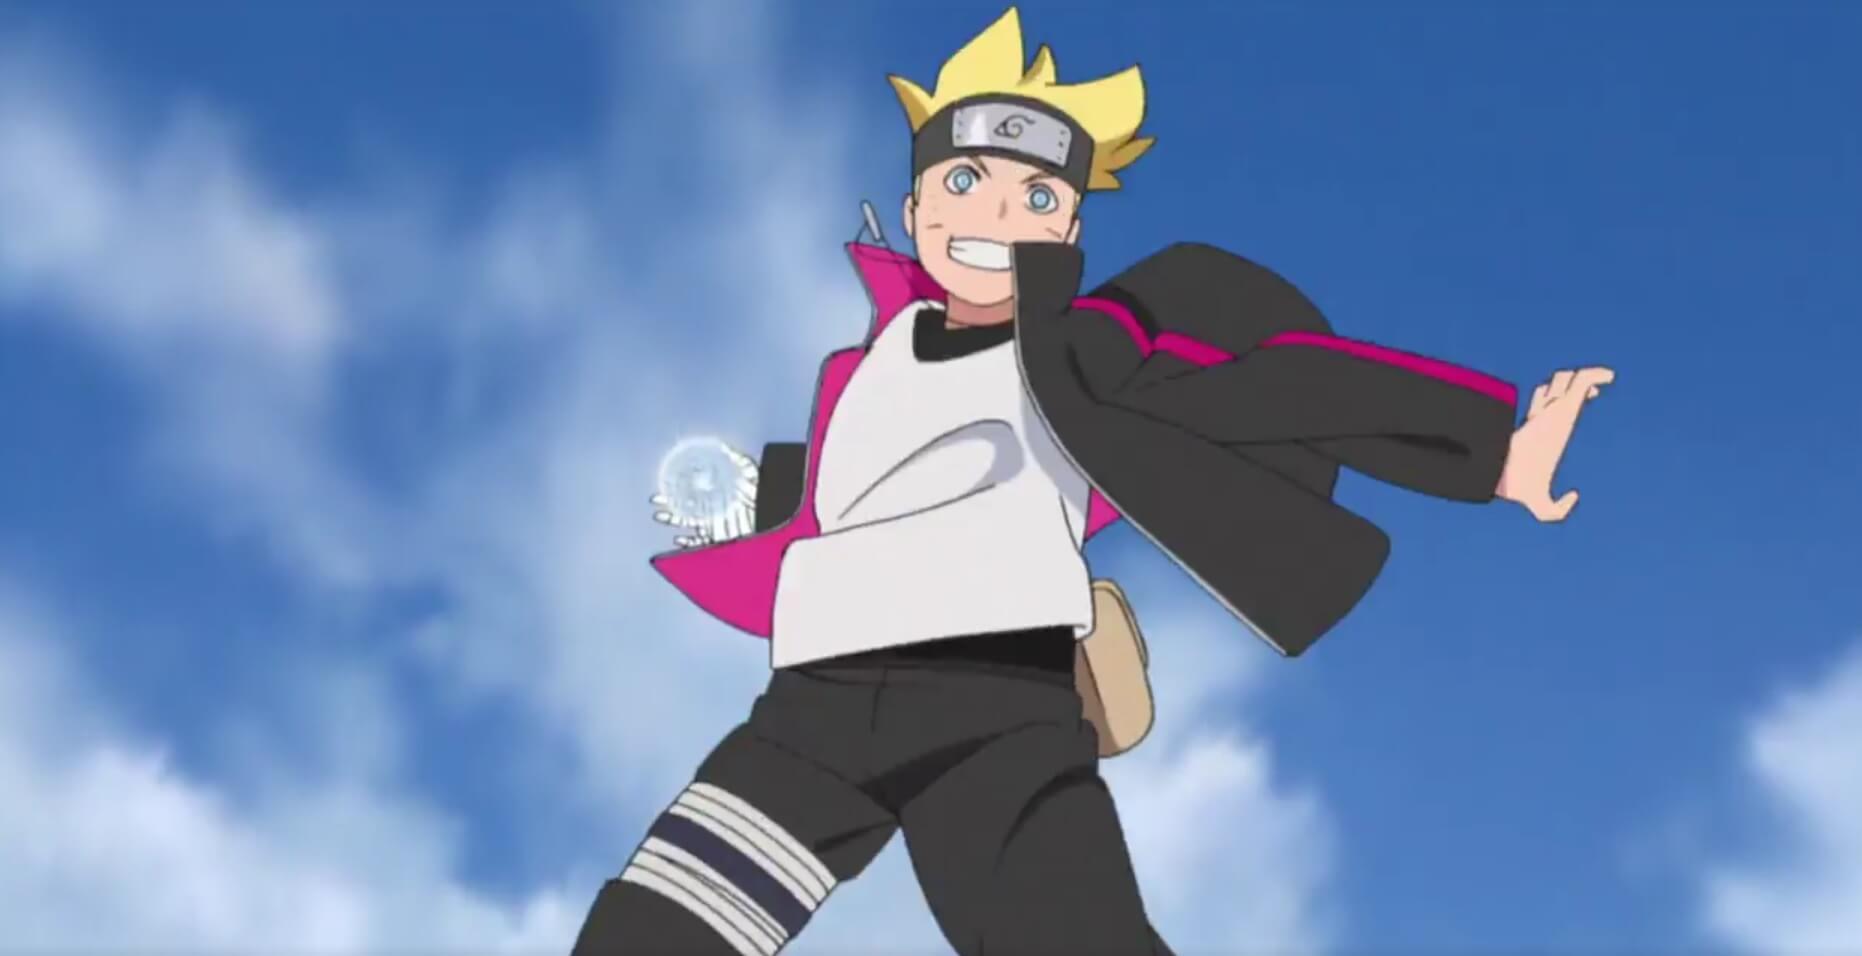 Boruto - Naruto Next Generations revela Trailer e Data - ptAnime